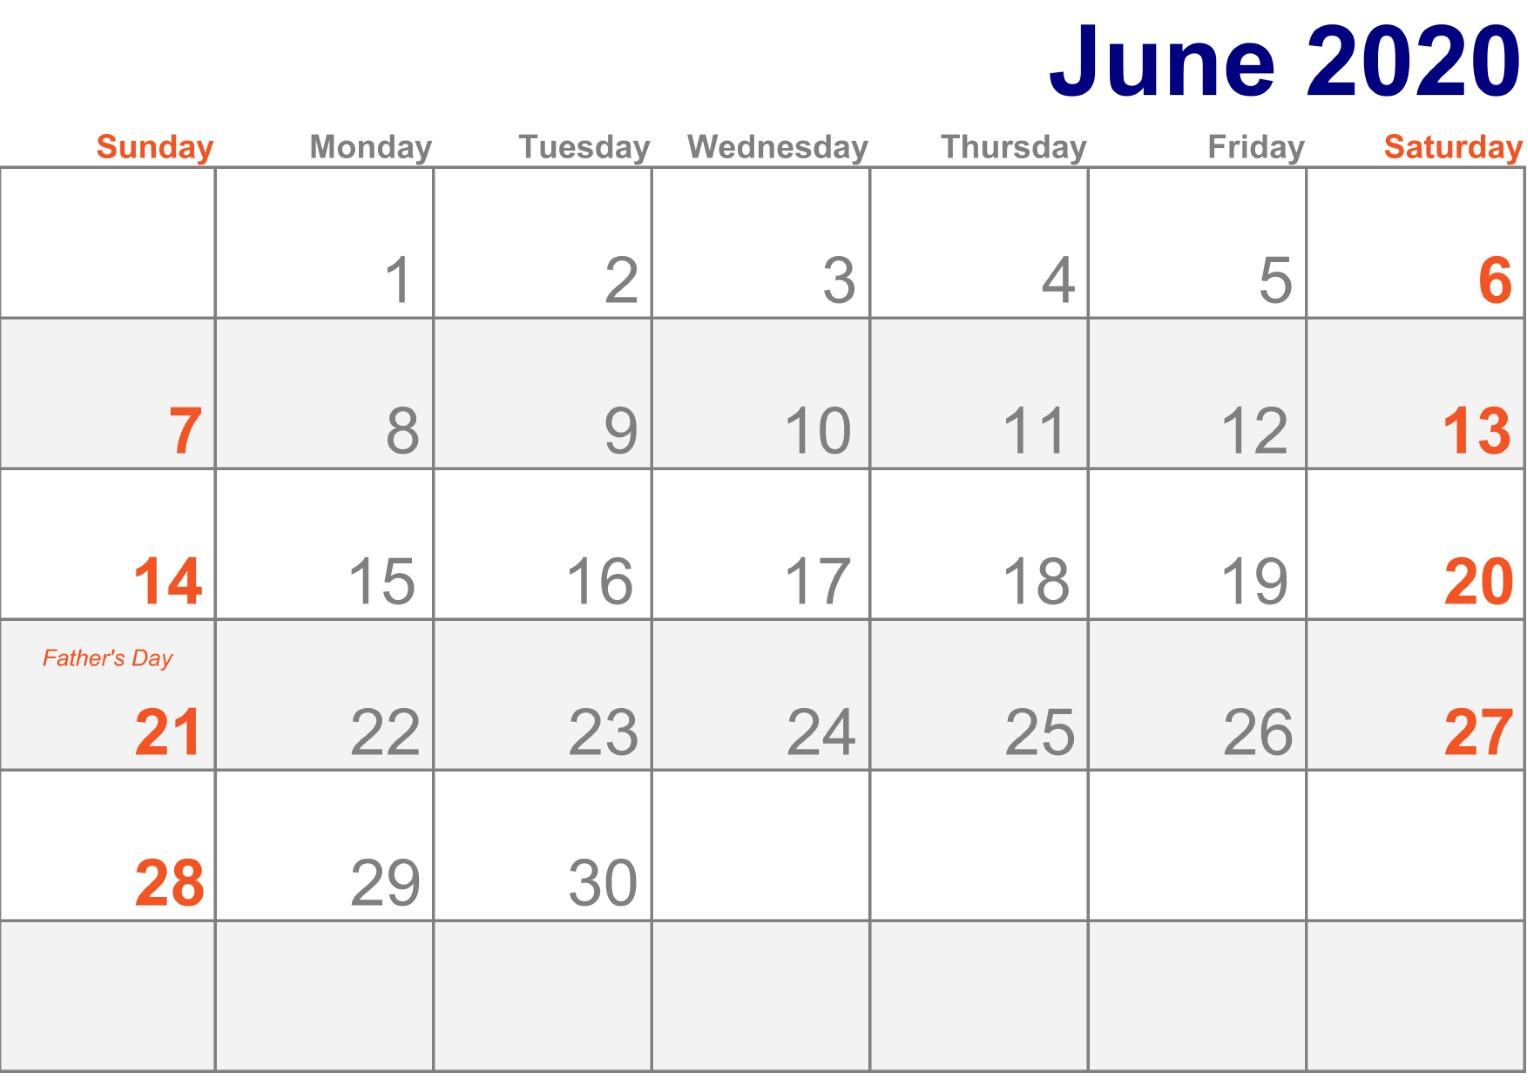 June 2020 Calendar Printable With Holidays